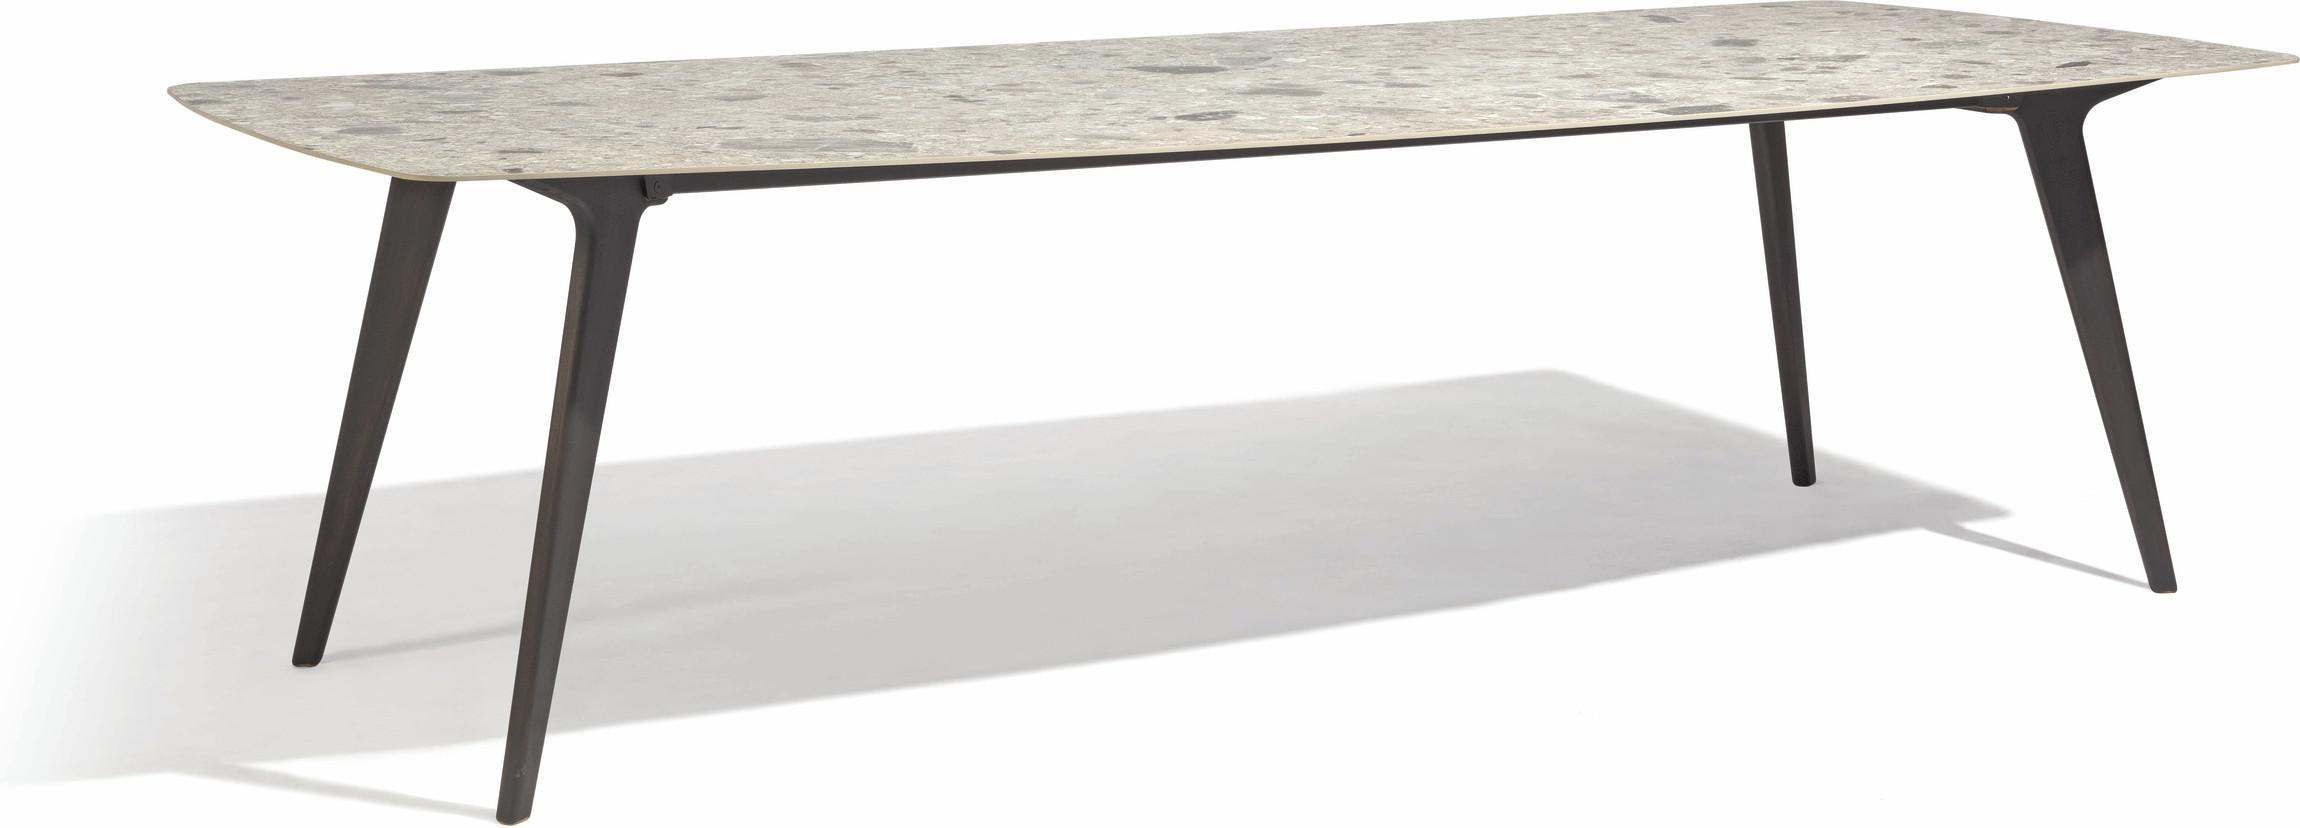 Table à manger Torsa - Teck nero - CF 264